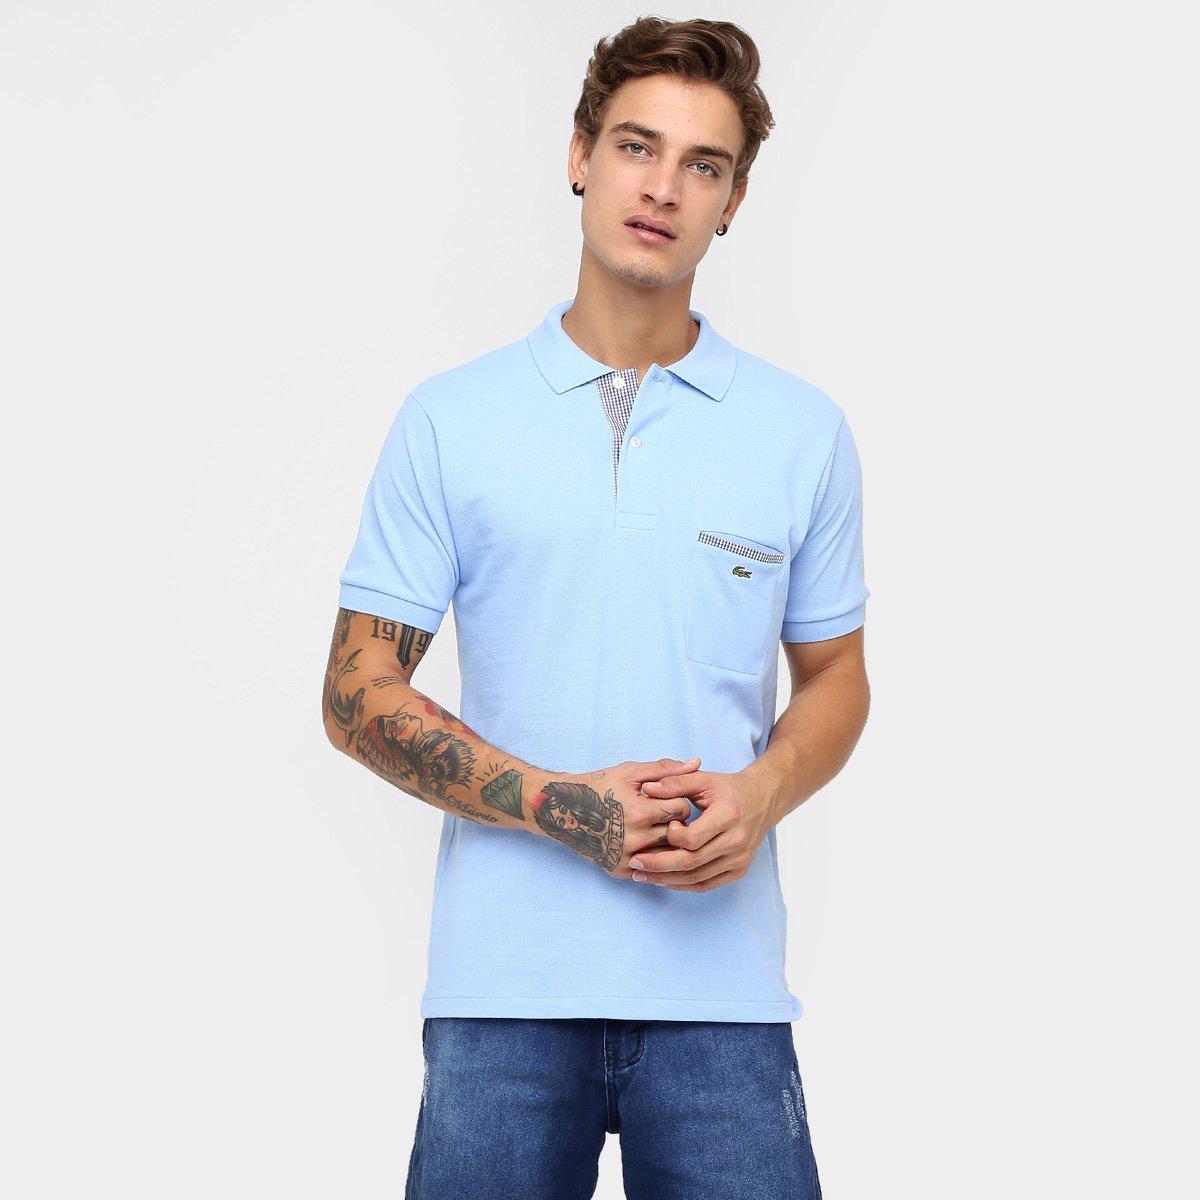 5500b7426f212 Camisa Polo Lacoste Original Fit Bolso - Azul Claro - Compre Agora ...